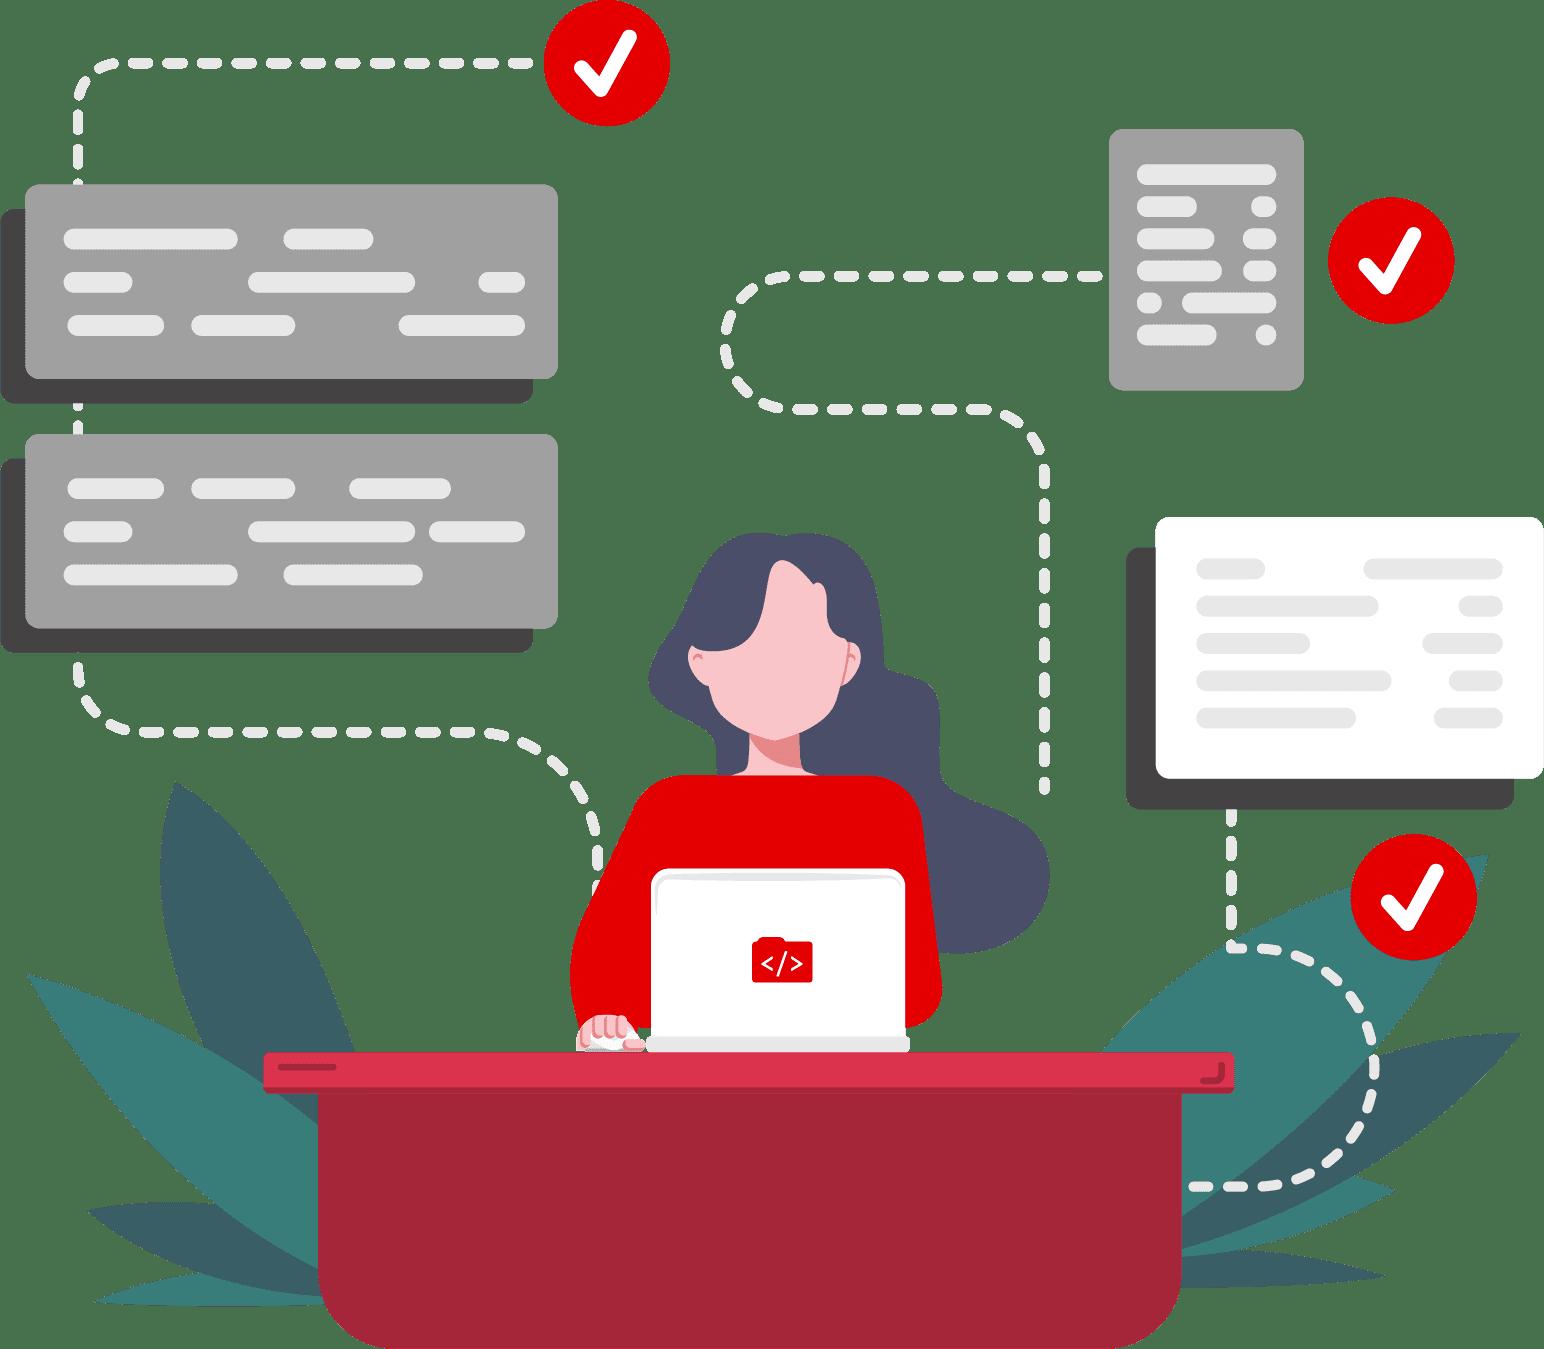 coderslink developer woman working remotely in her laptop receiving notifications